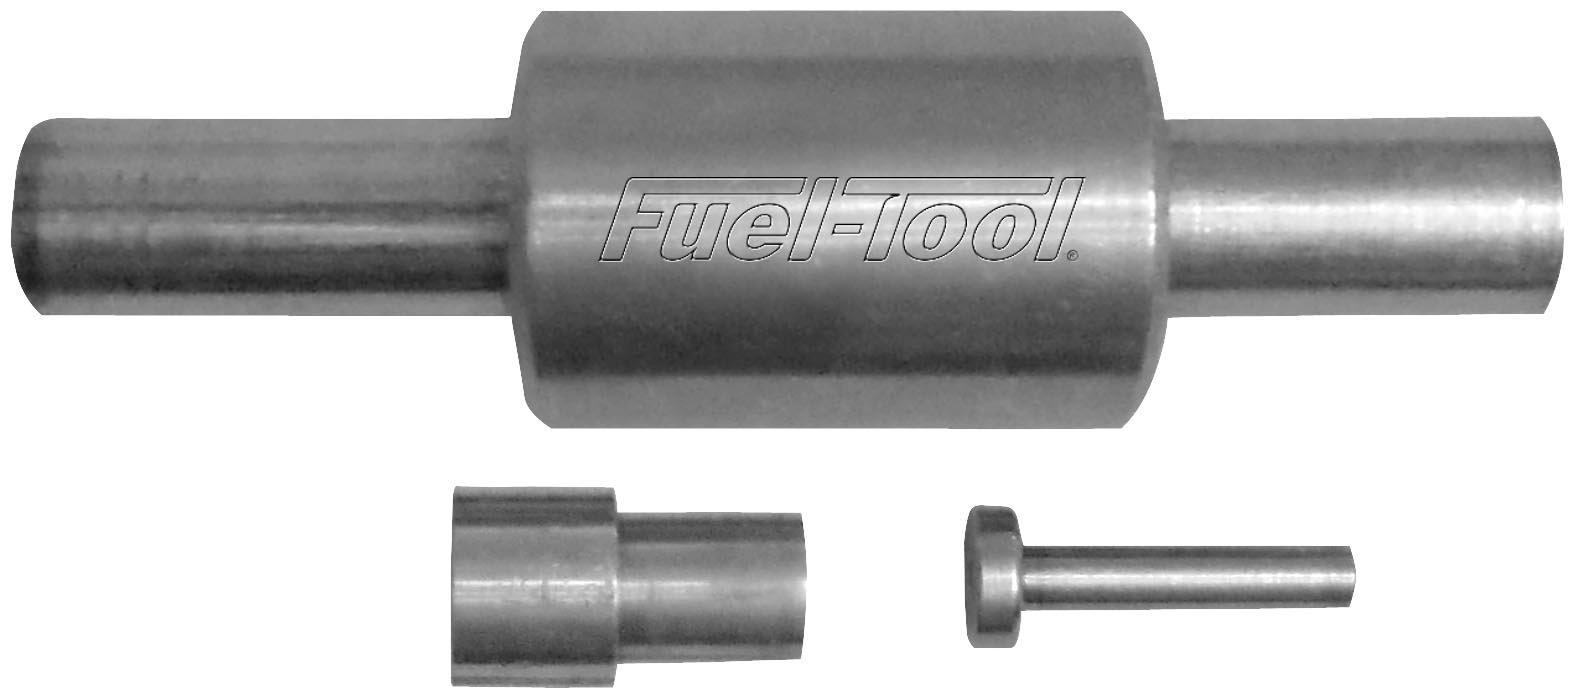 Fuel-Tool Check Valve Repair Tools MC-400 by Fuel-Tool (Image #1)